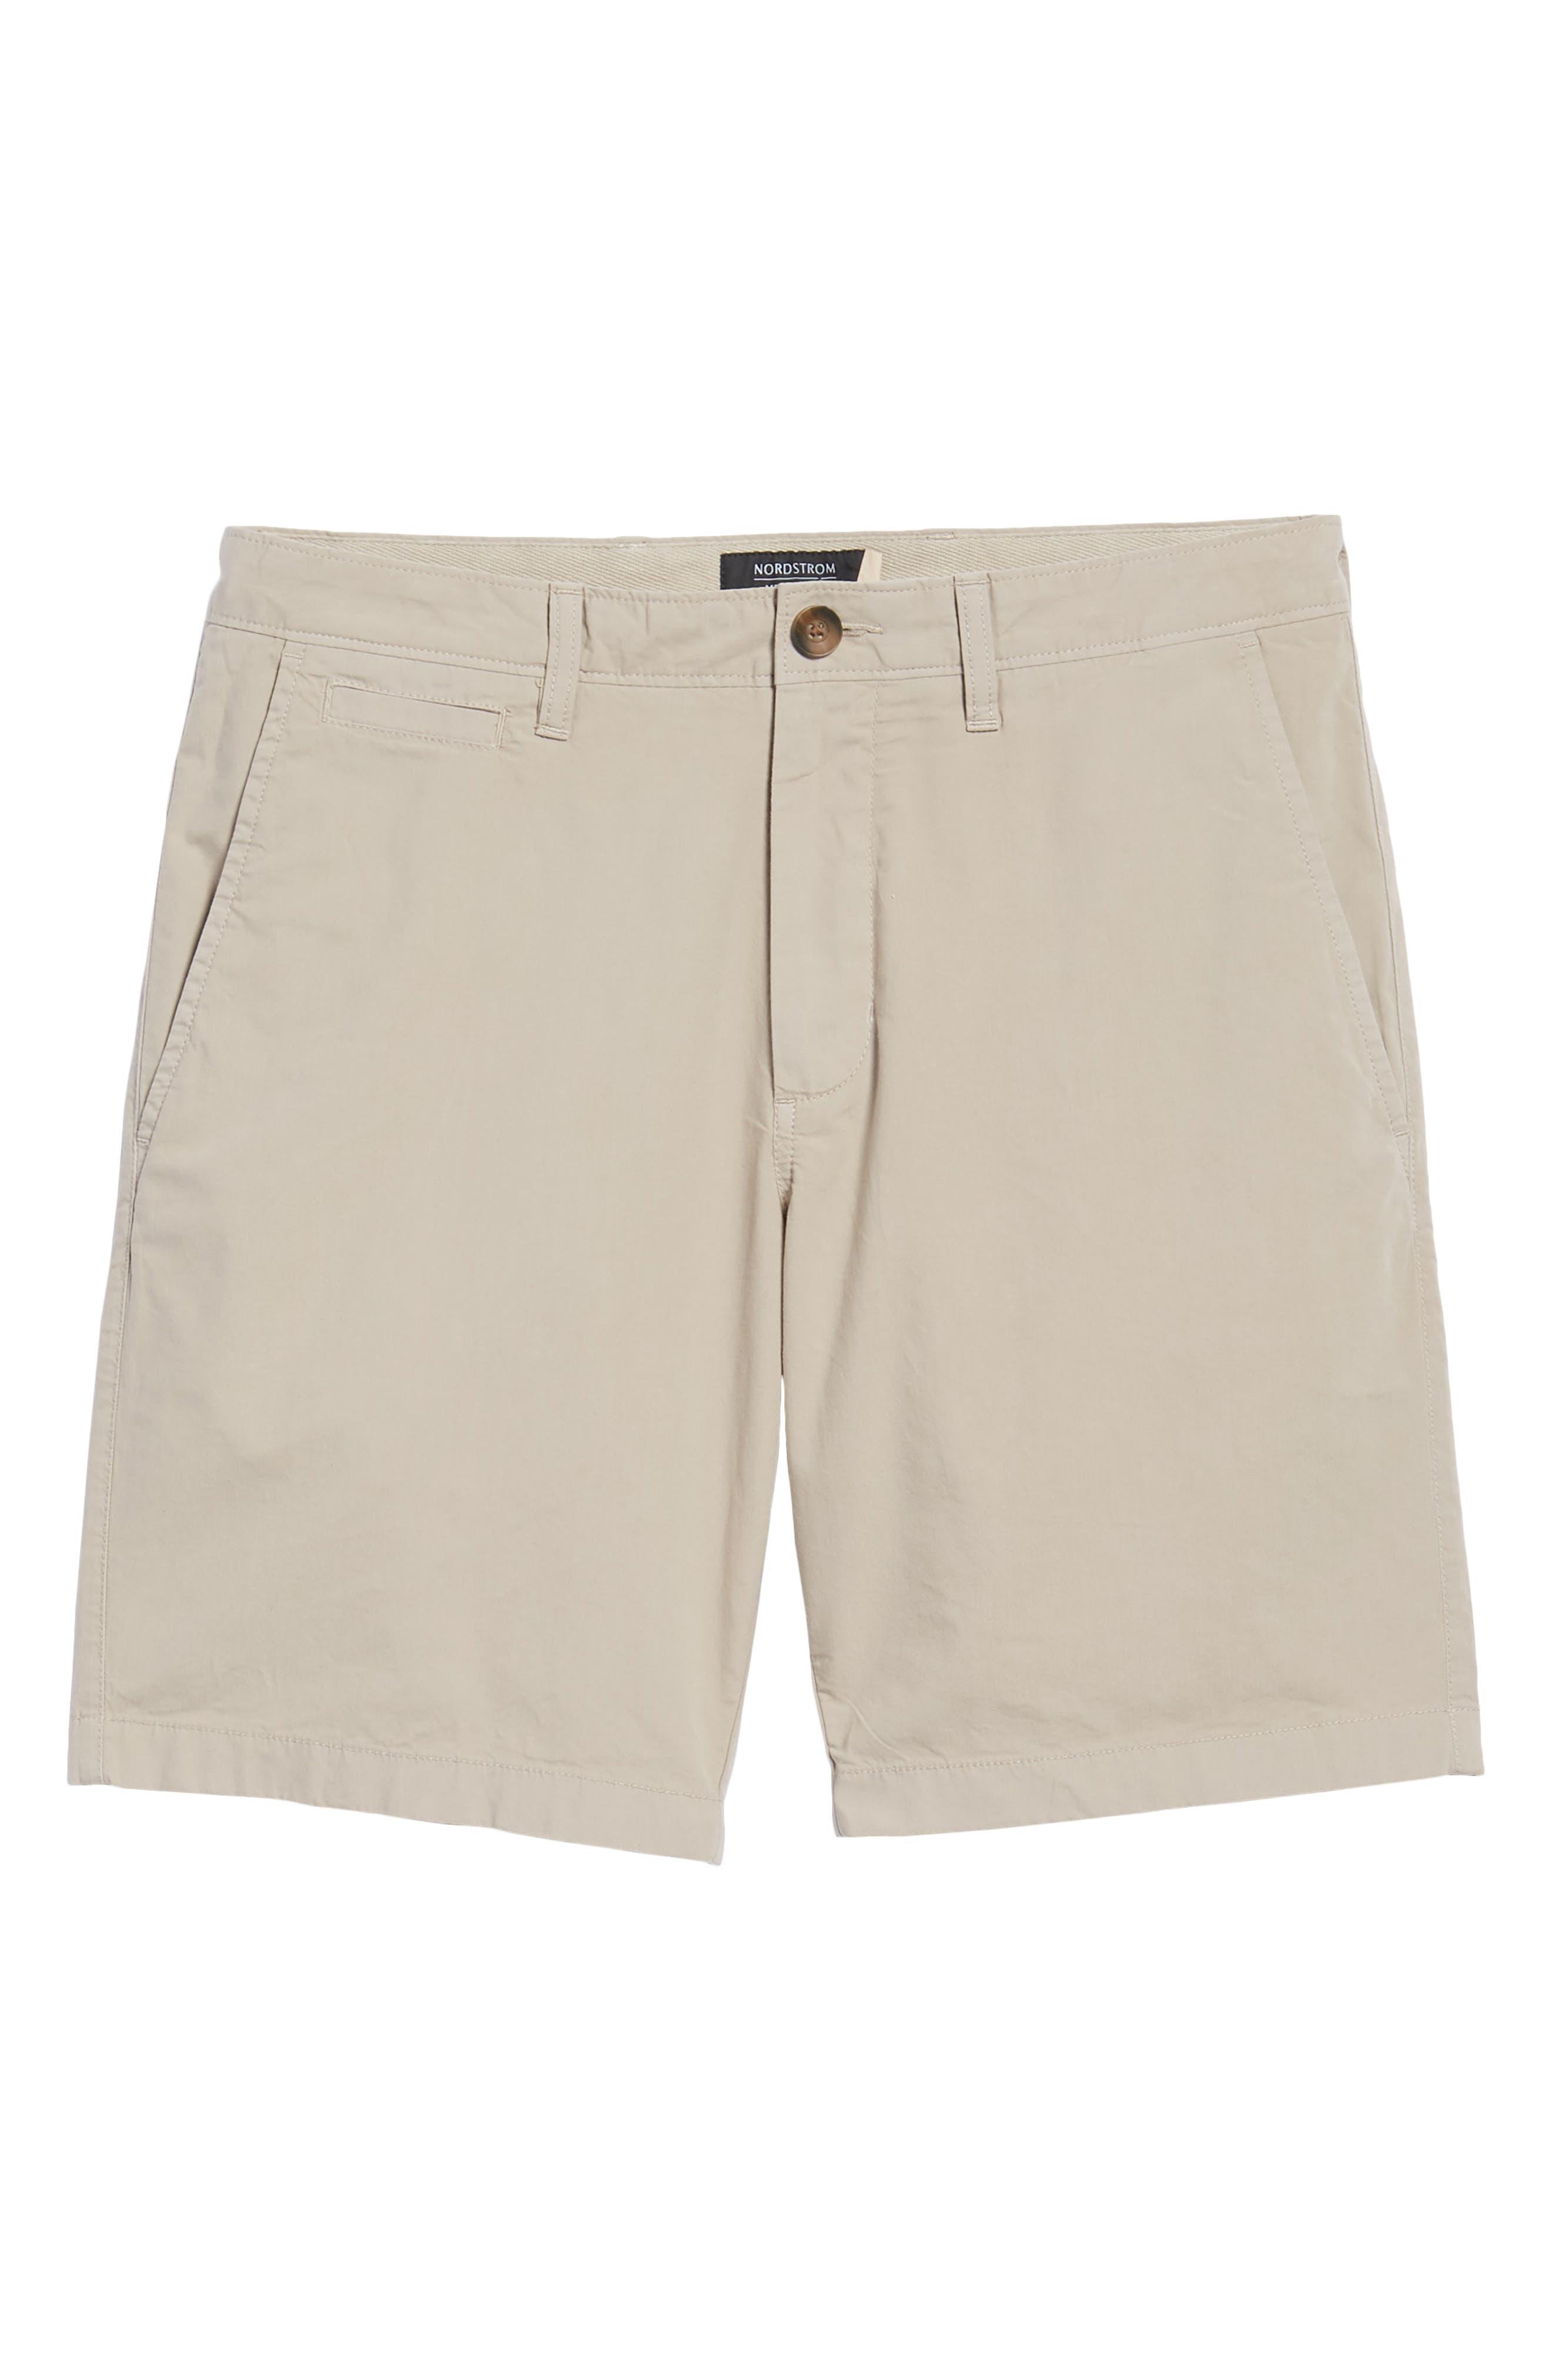 Stretch Poplin Shorts,                             Alternate thumbnail 6, color,                             Tan Thread